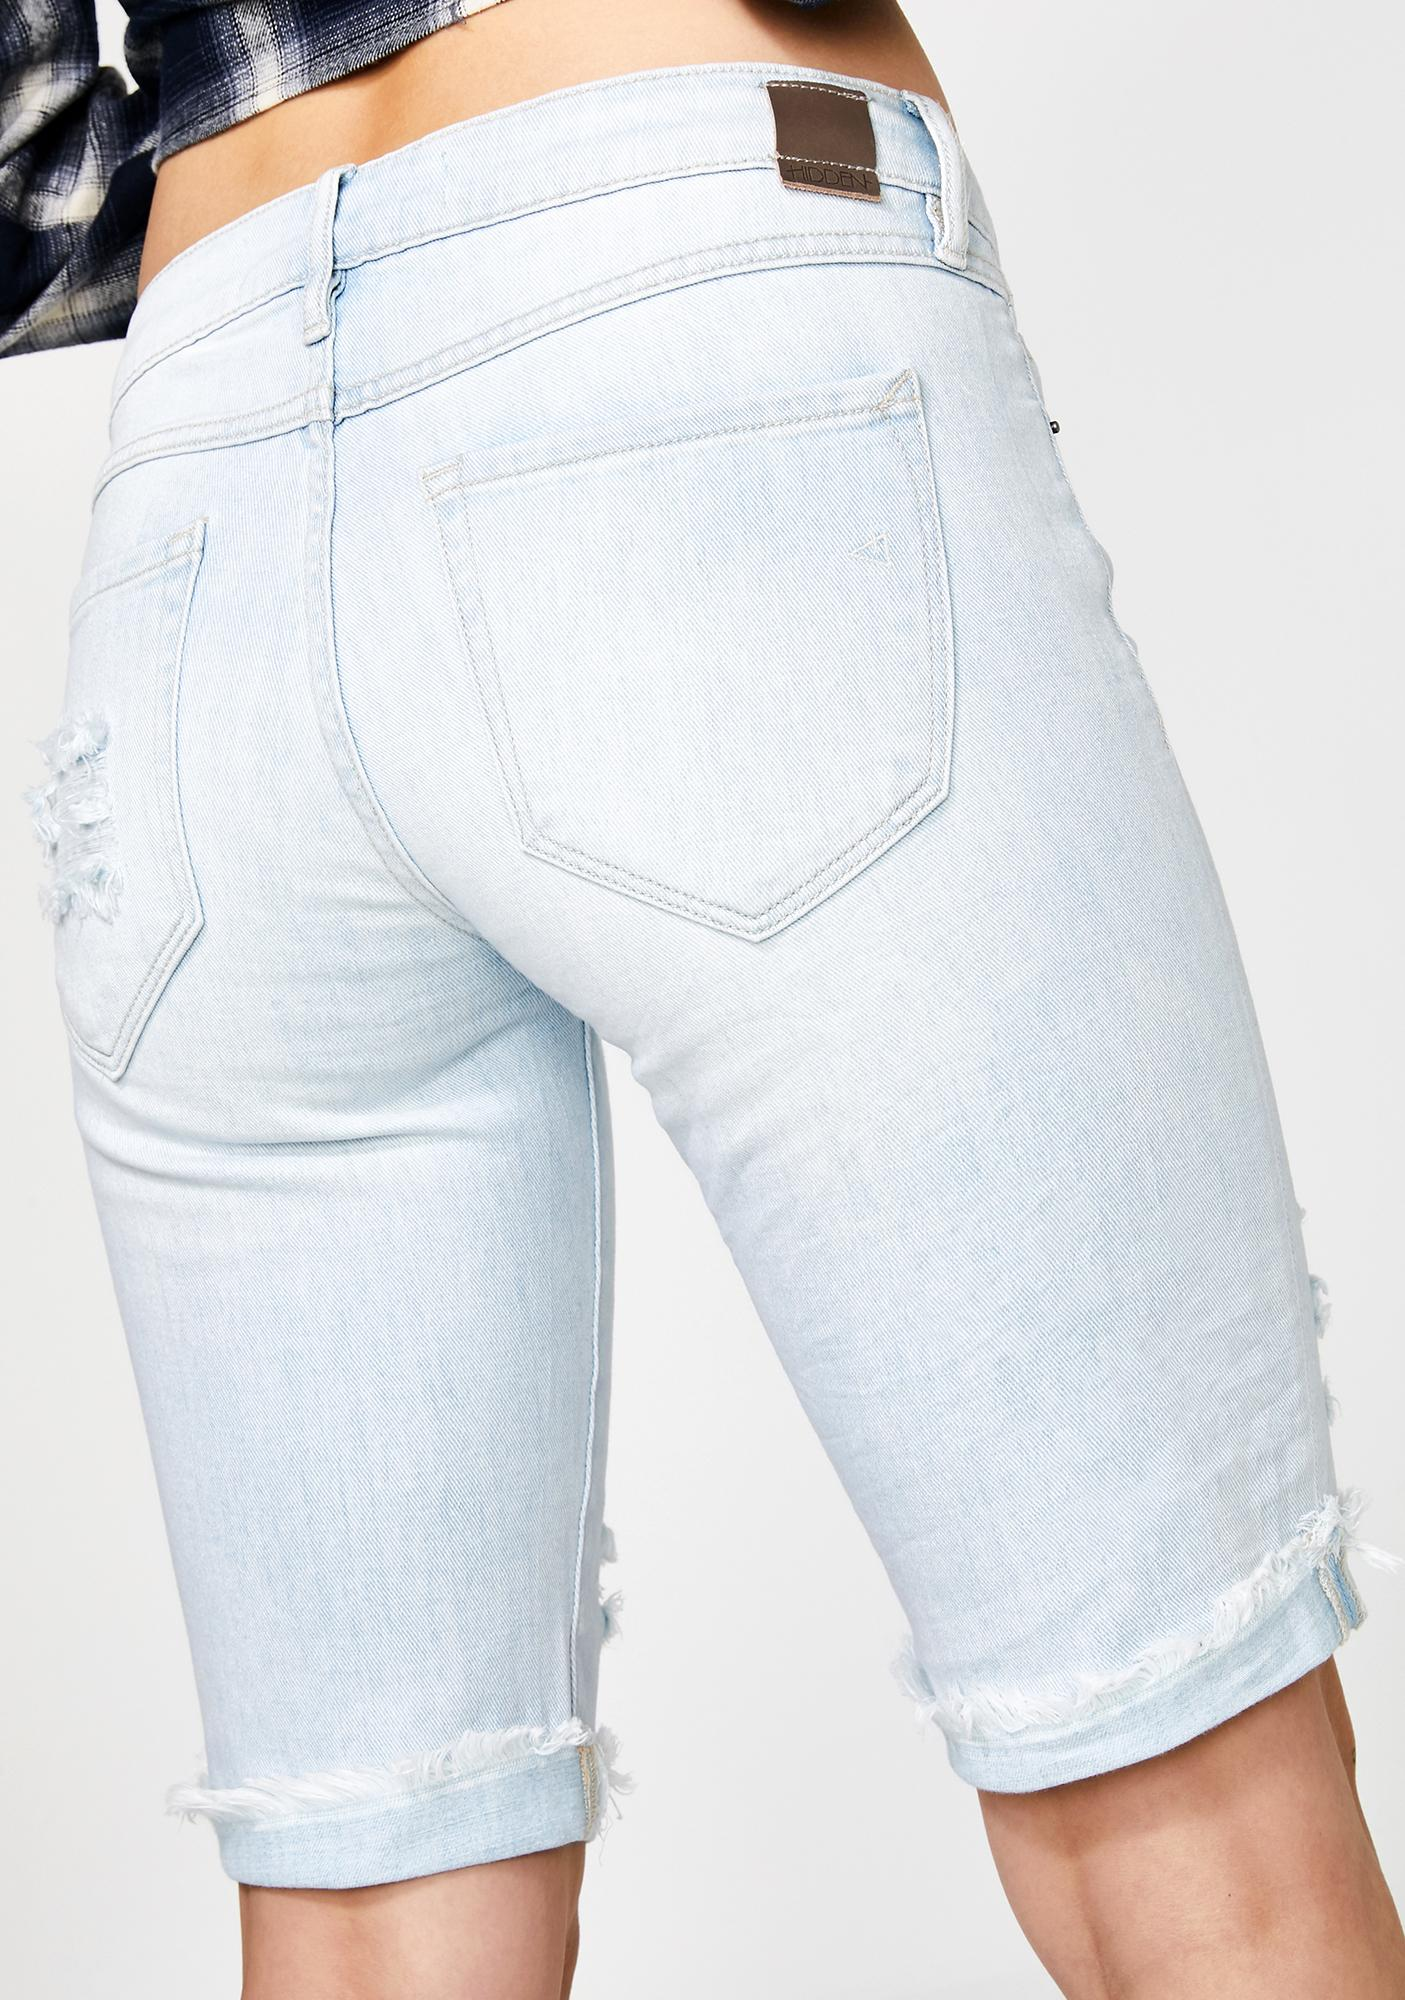 Hidden Denim Super Light Wash Distressed Bermuda Shorts